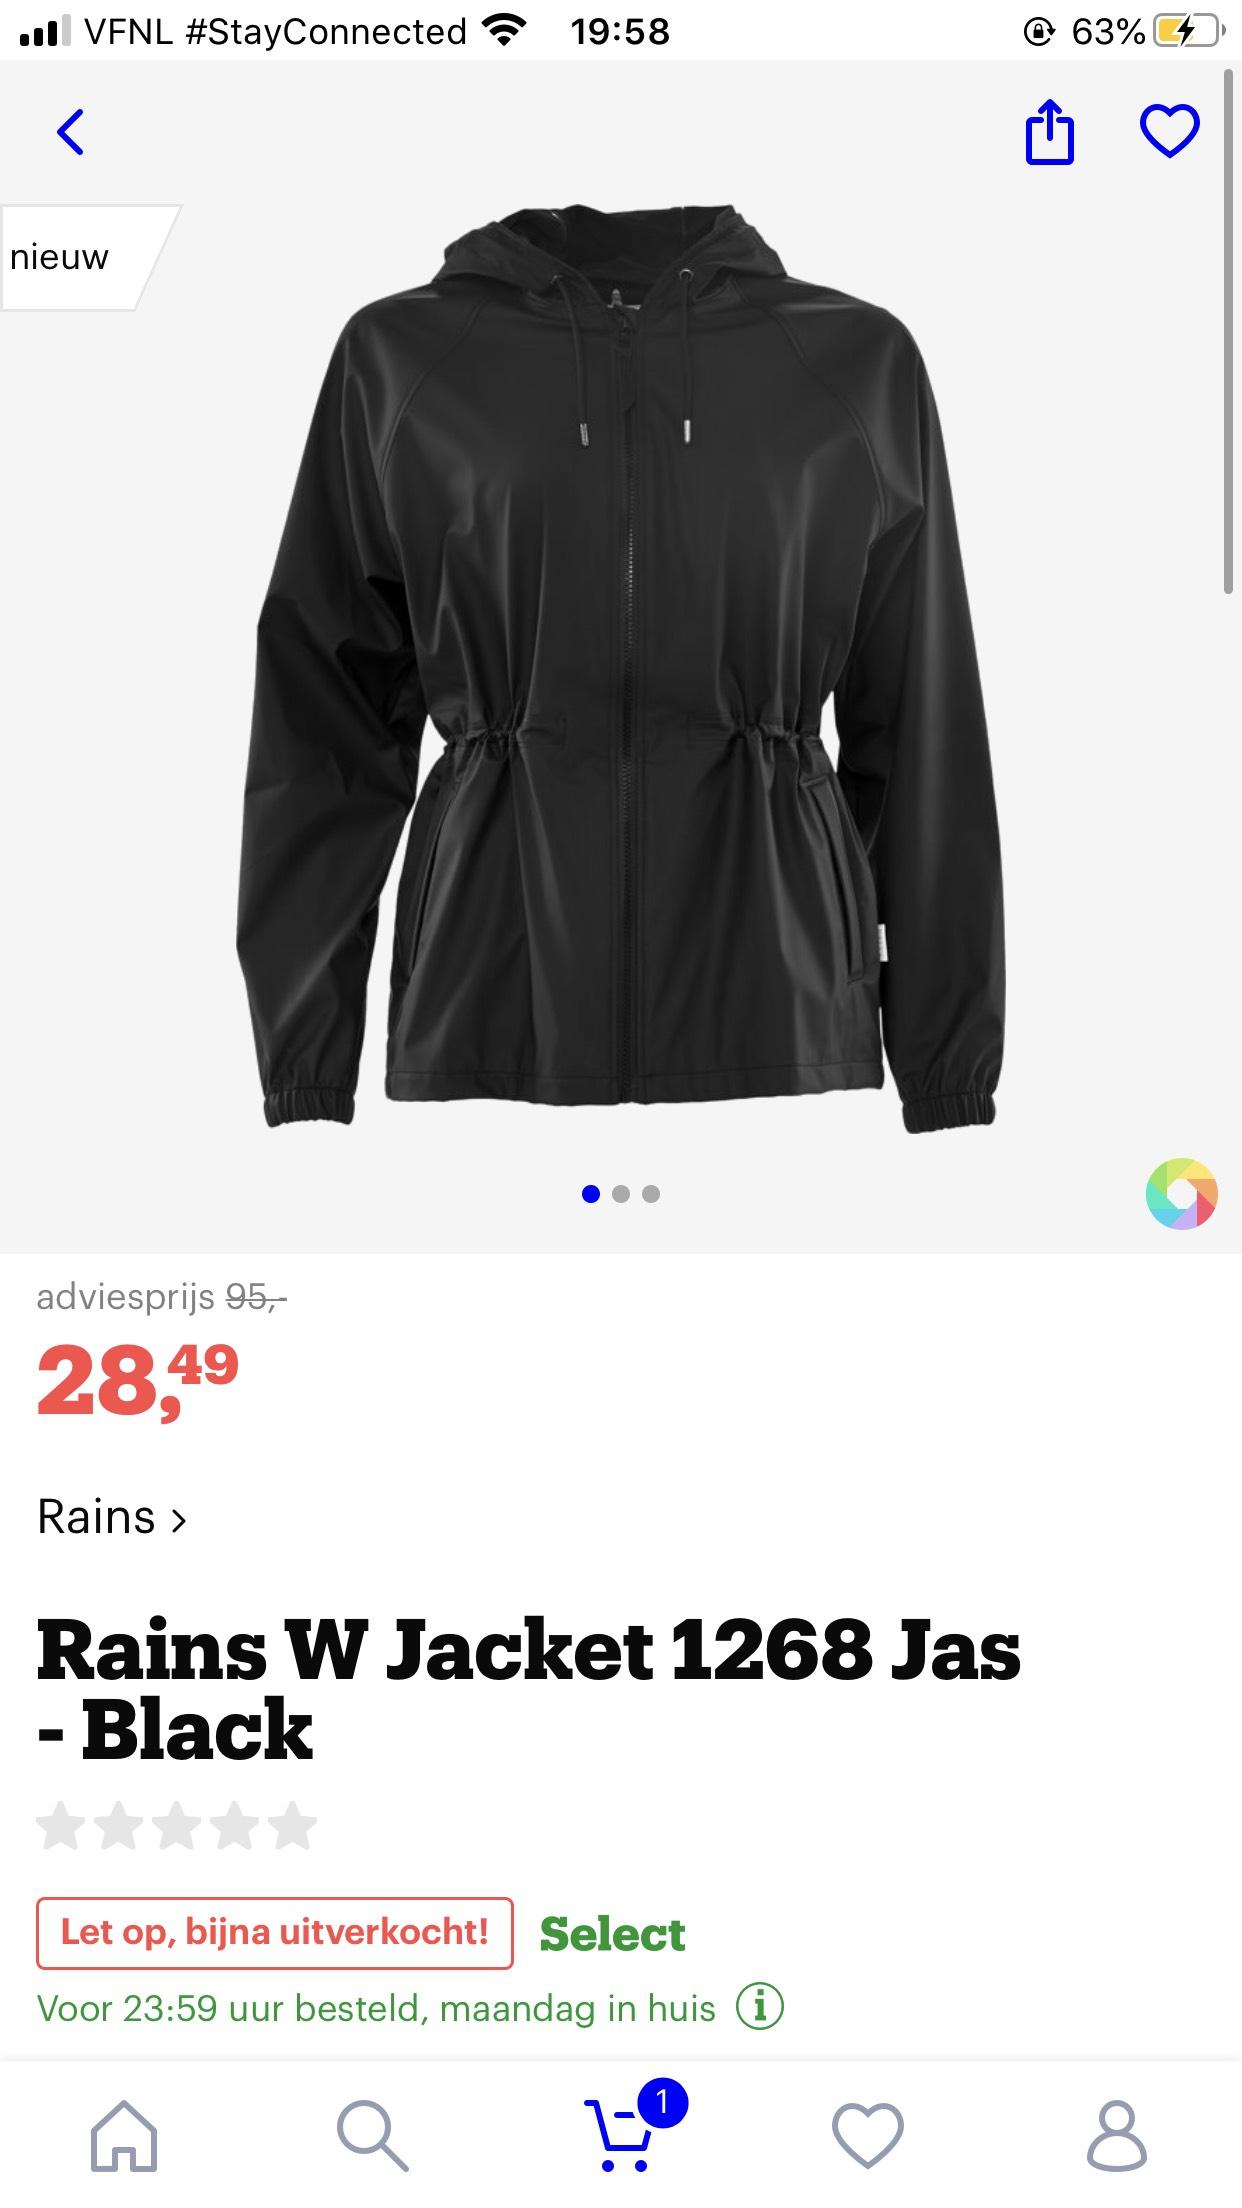 Rains dames regenjas NOG ALLE MATEN